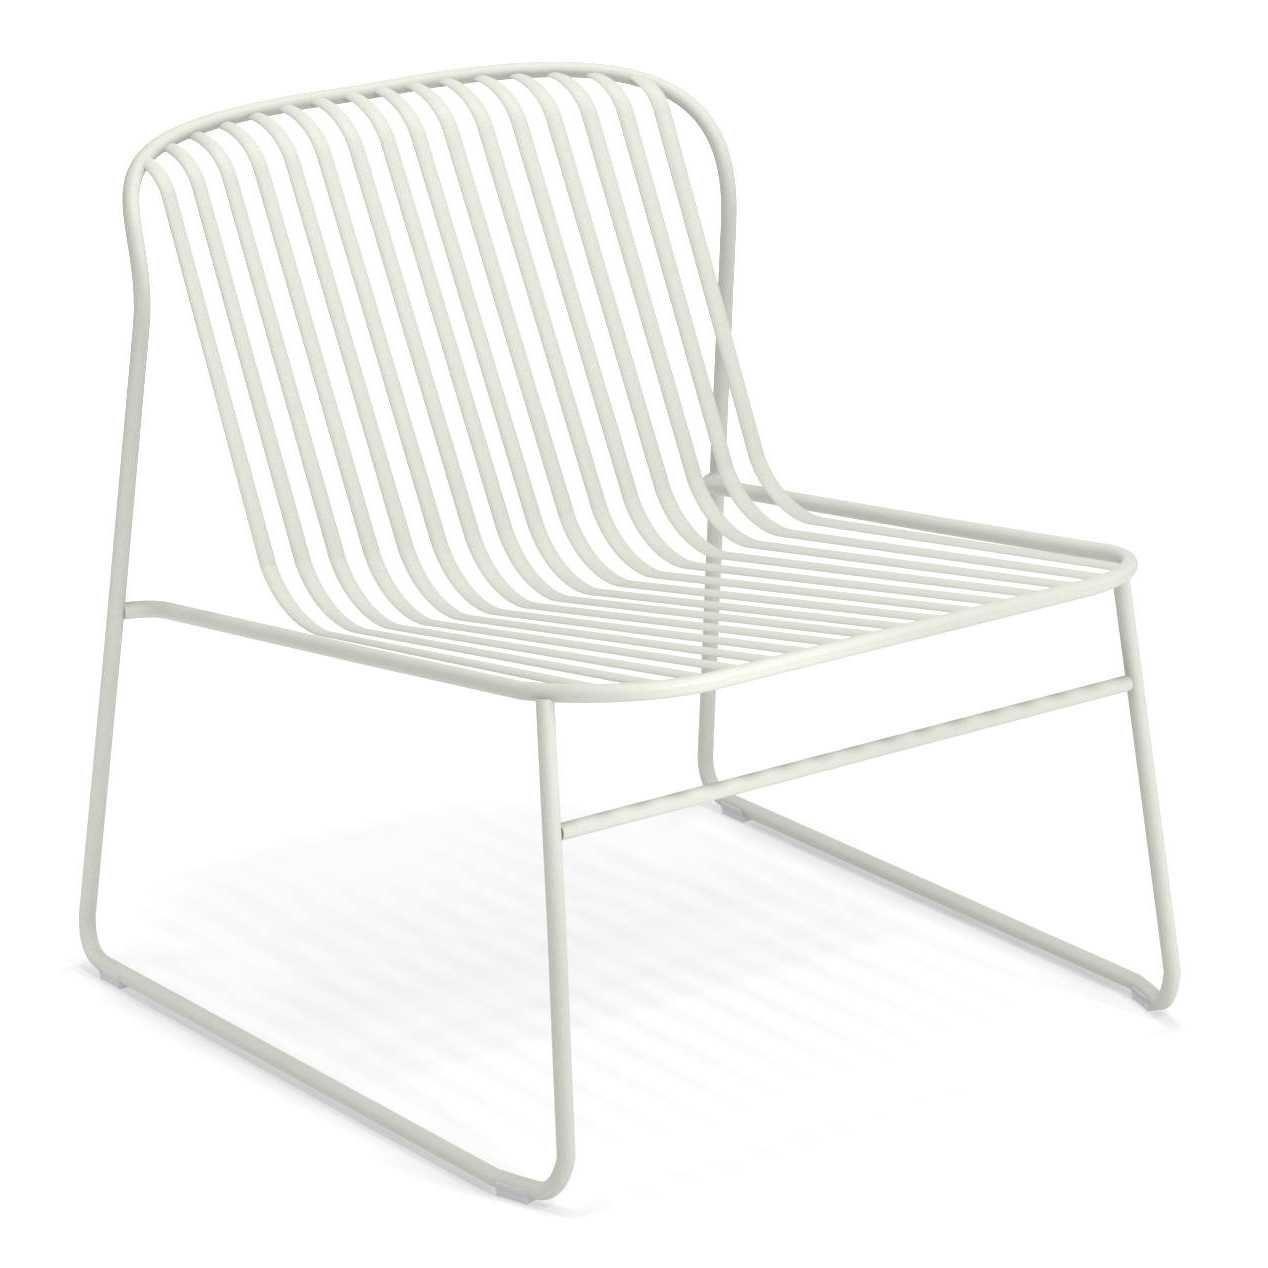 Emu Riviera fauteuil mat wit